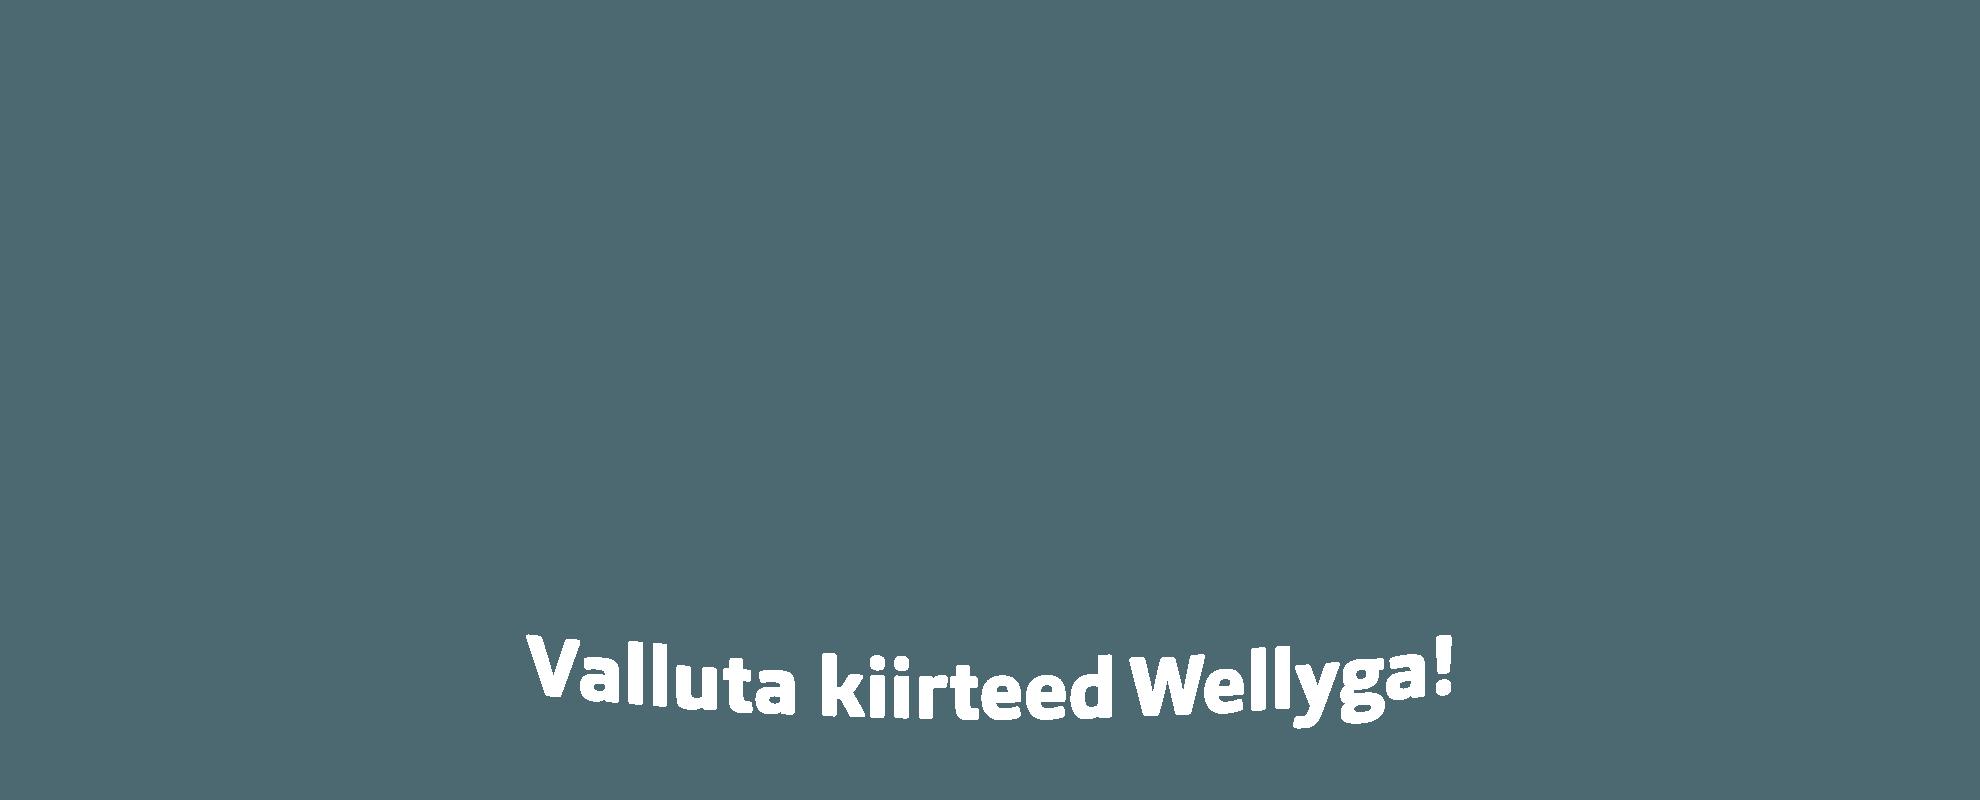 Welly_banner_tekst